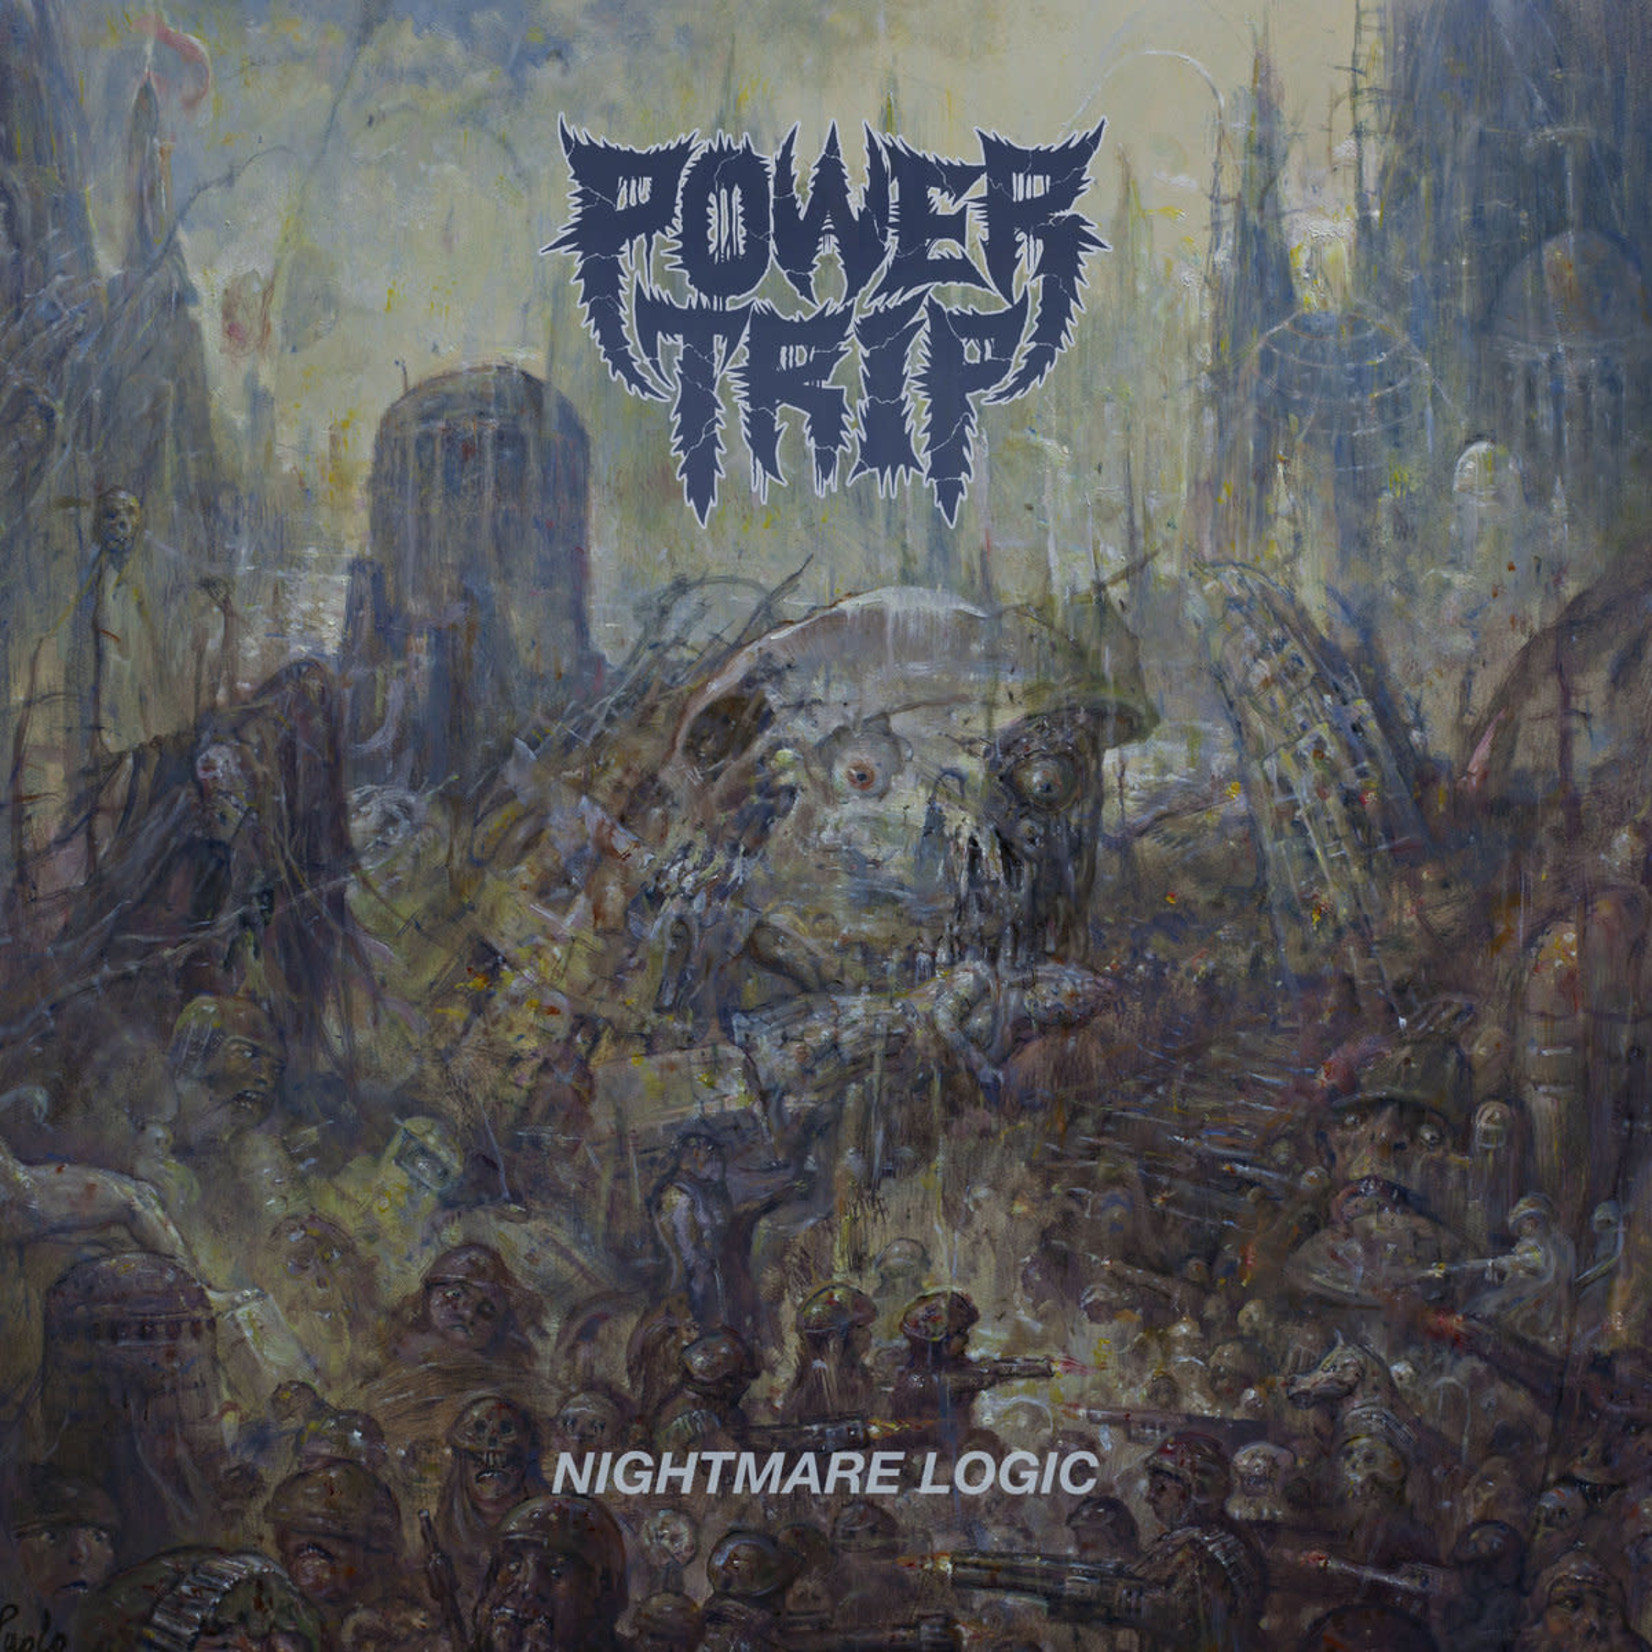 [New] Power Trip: Nightmare Logic